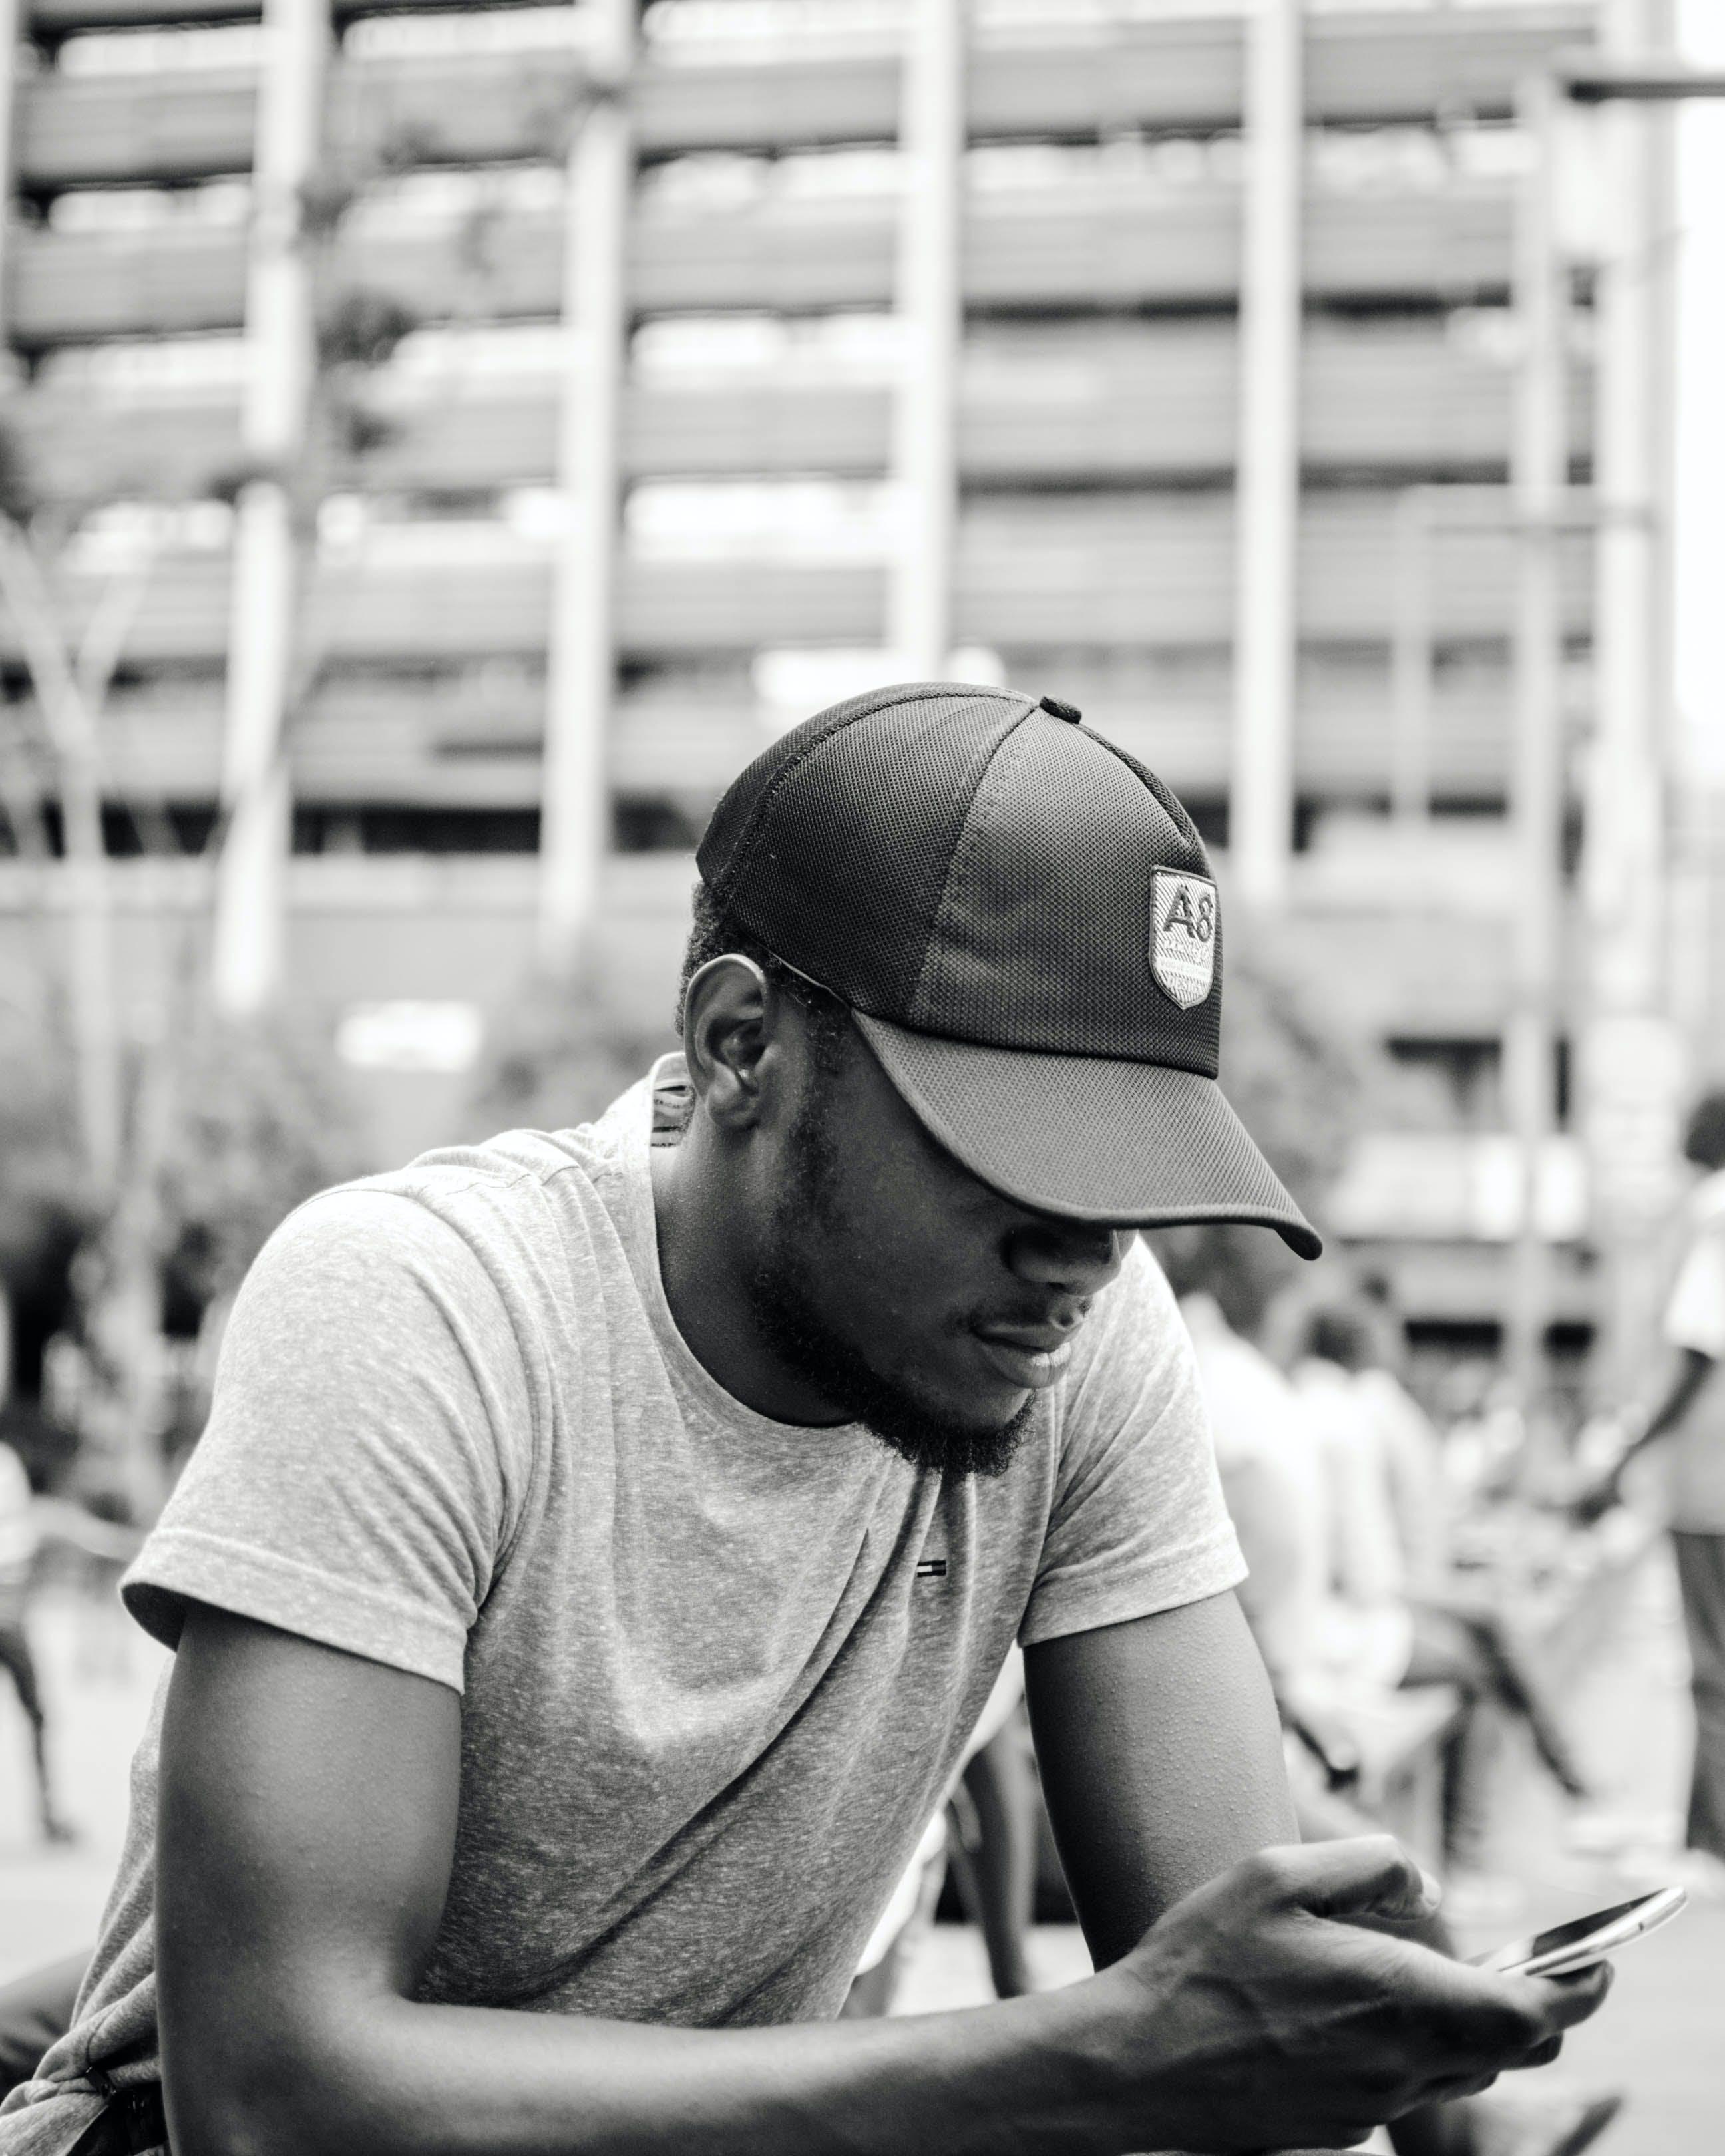 Monochrome Photo of Man Texting